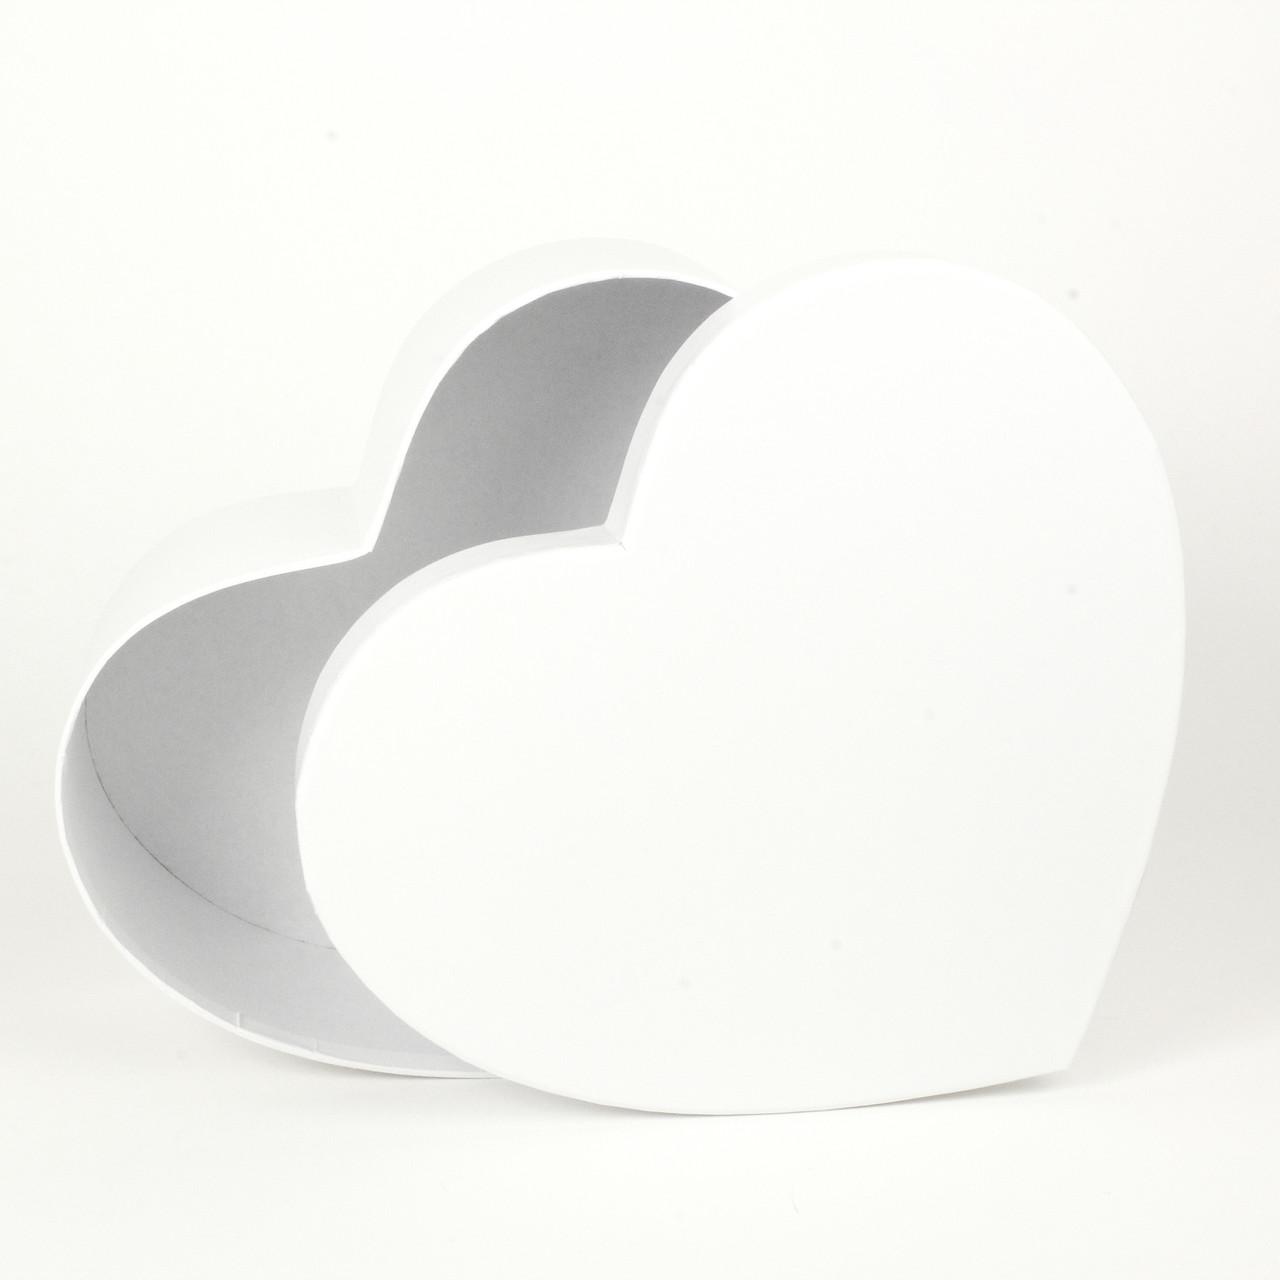 Подарочная коробка в форме сердца белая 19 х 17 х 7 см